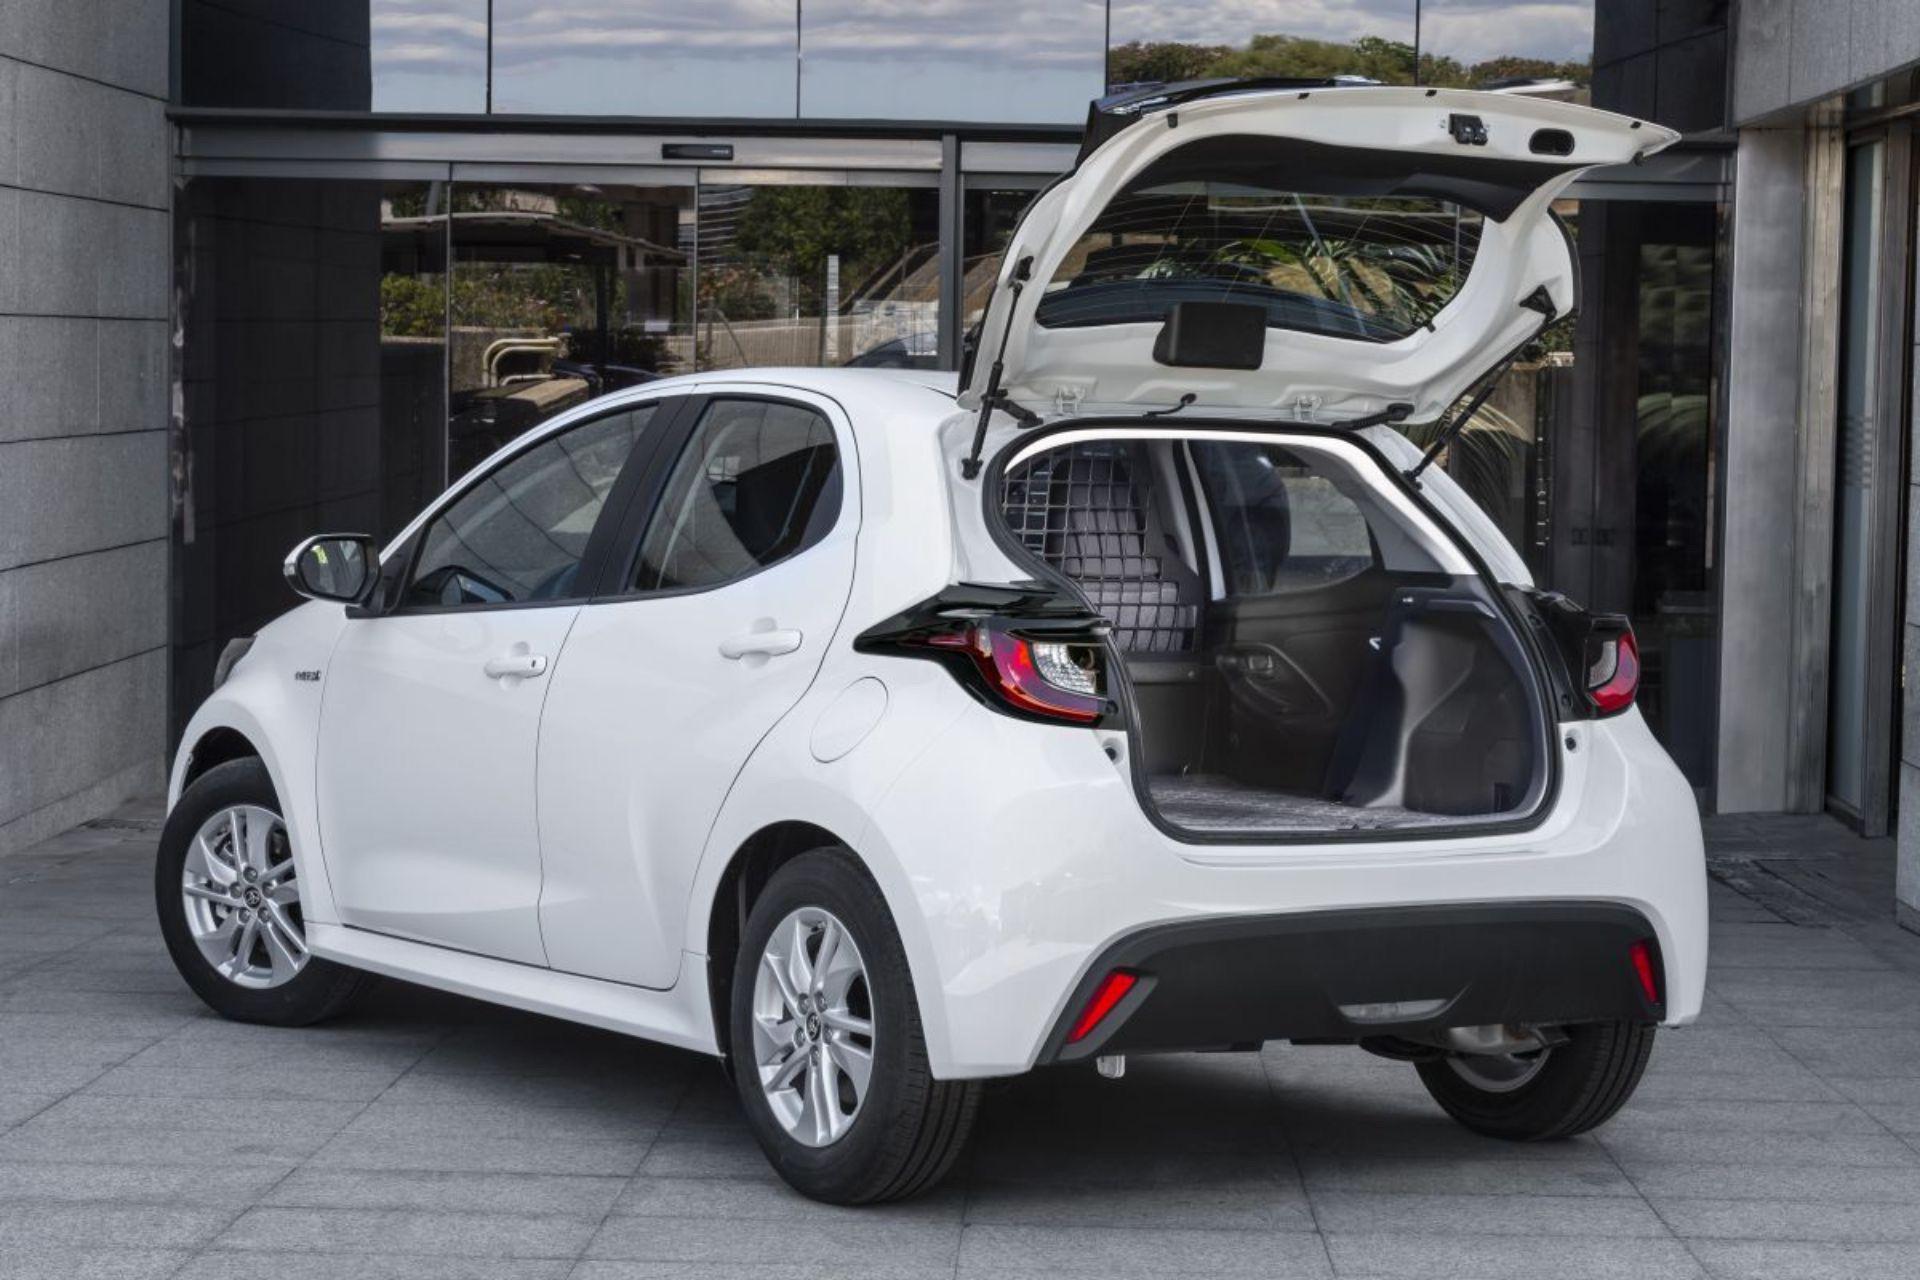 Toyota_Yaris_ECOVan-0002